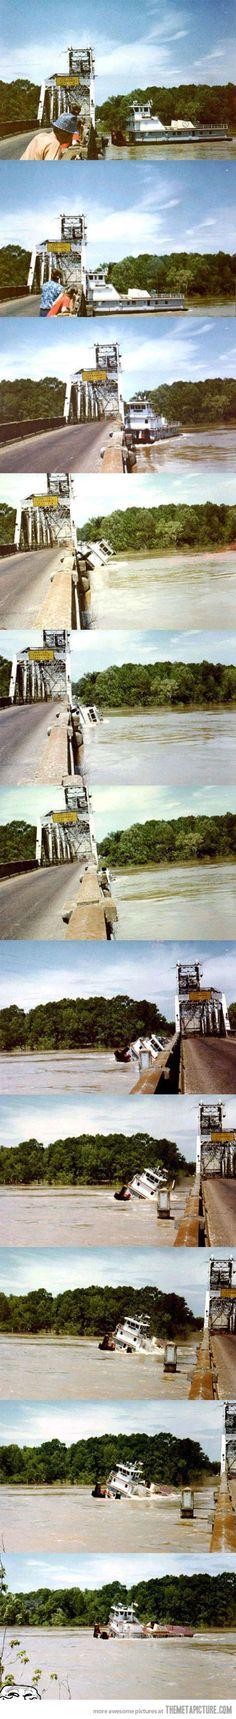 How a boat crossing bridge like a sir